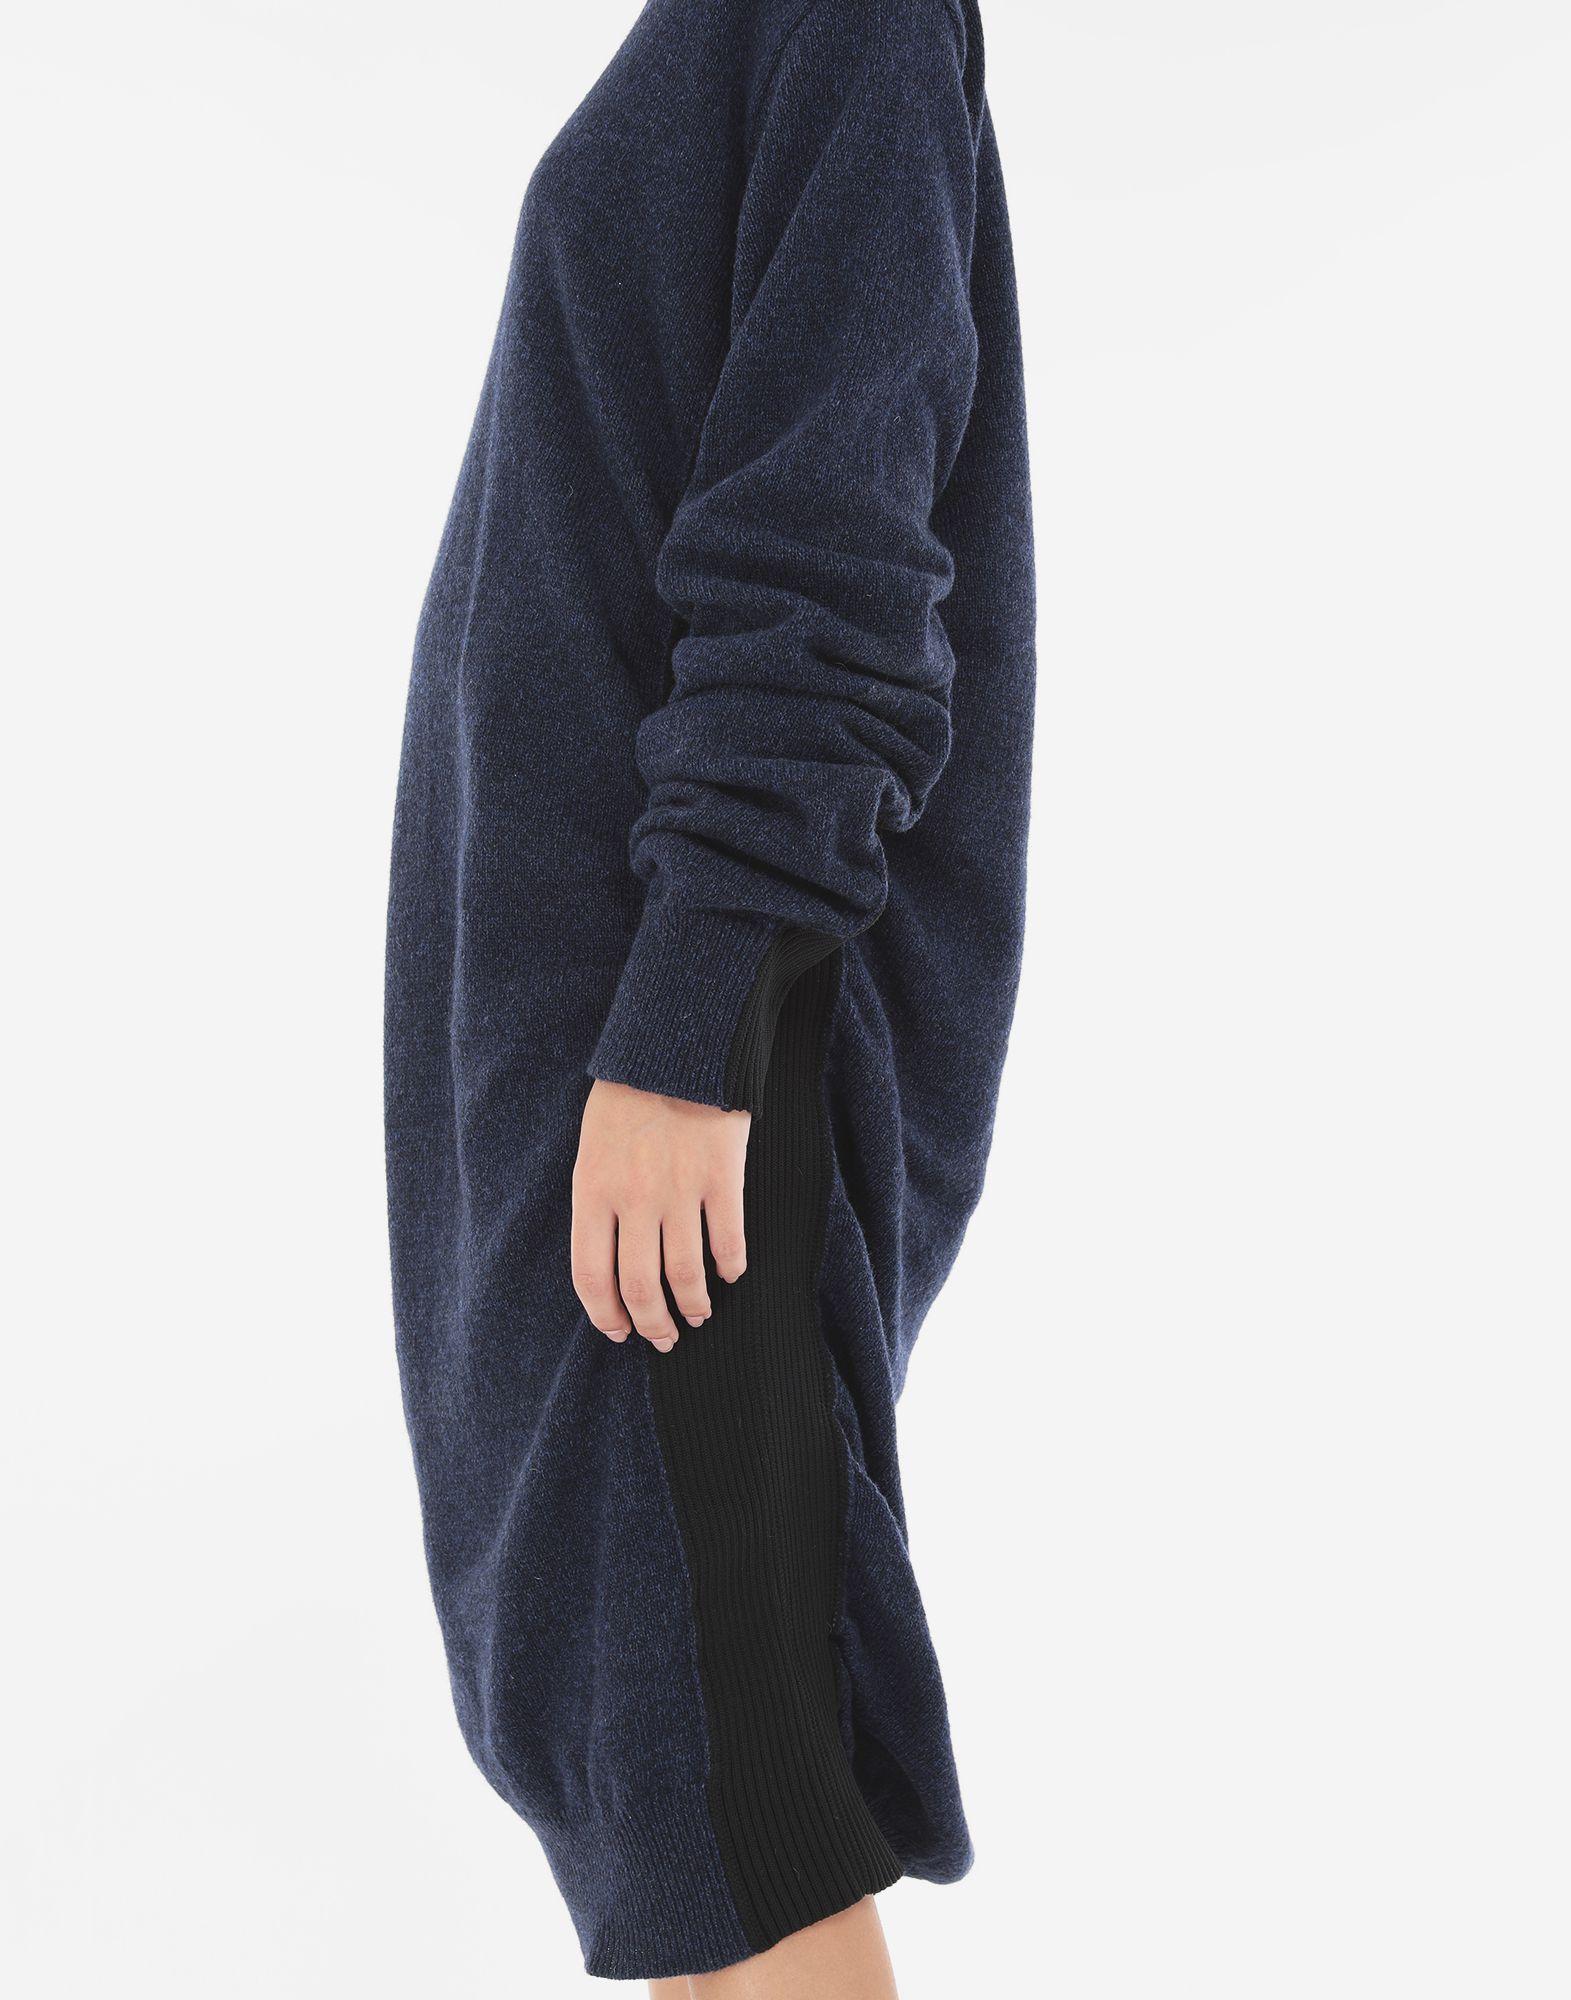 MM6 MAISON MARGIELA Ruched wool dress Dress Woman b